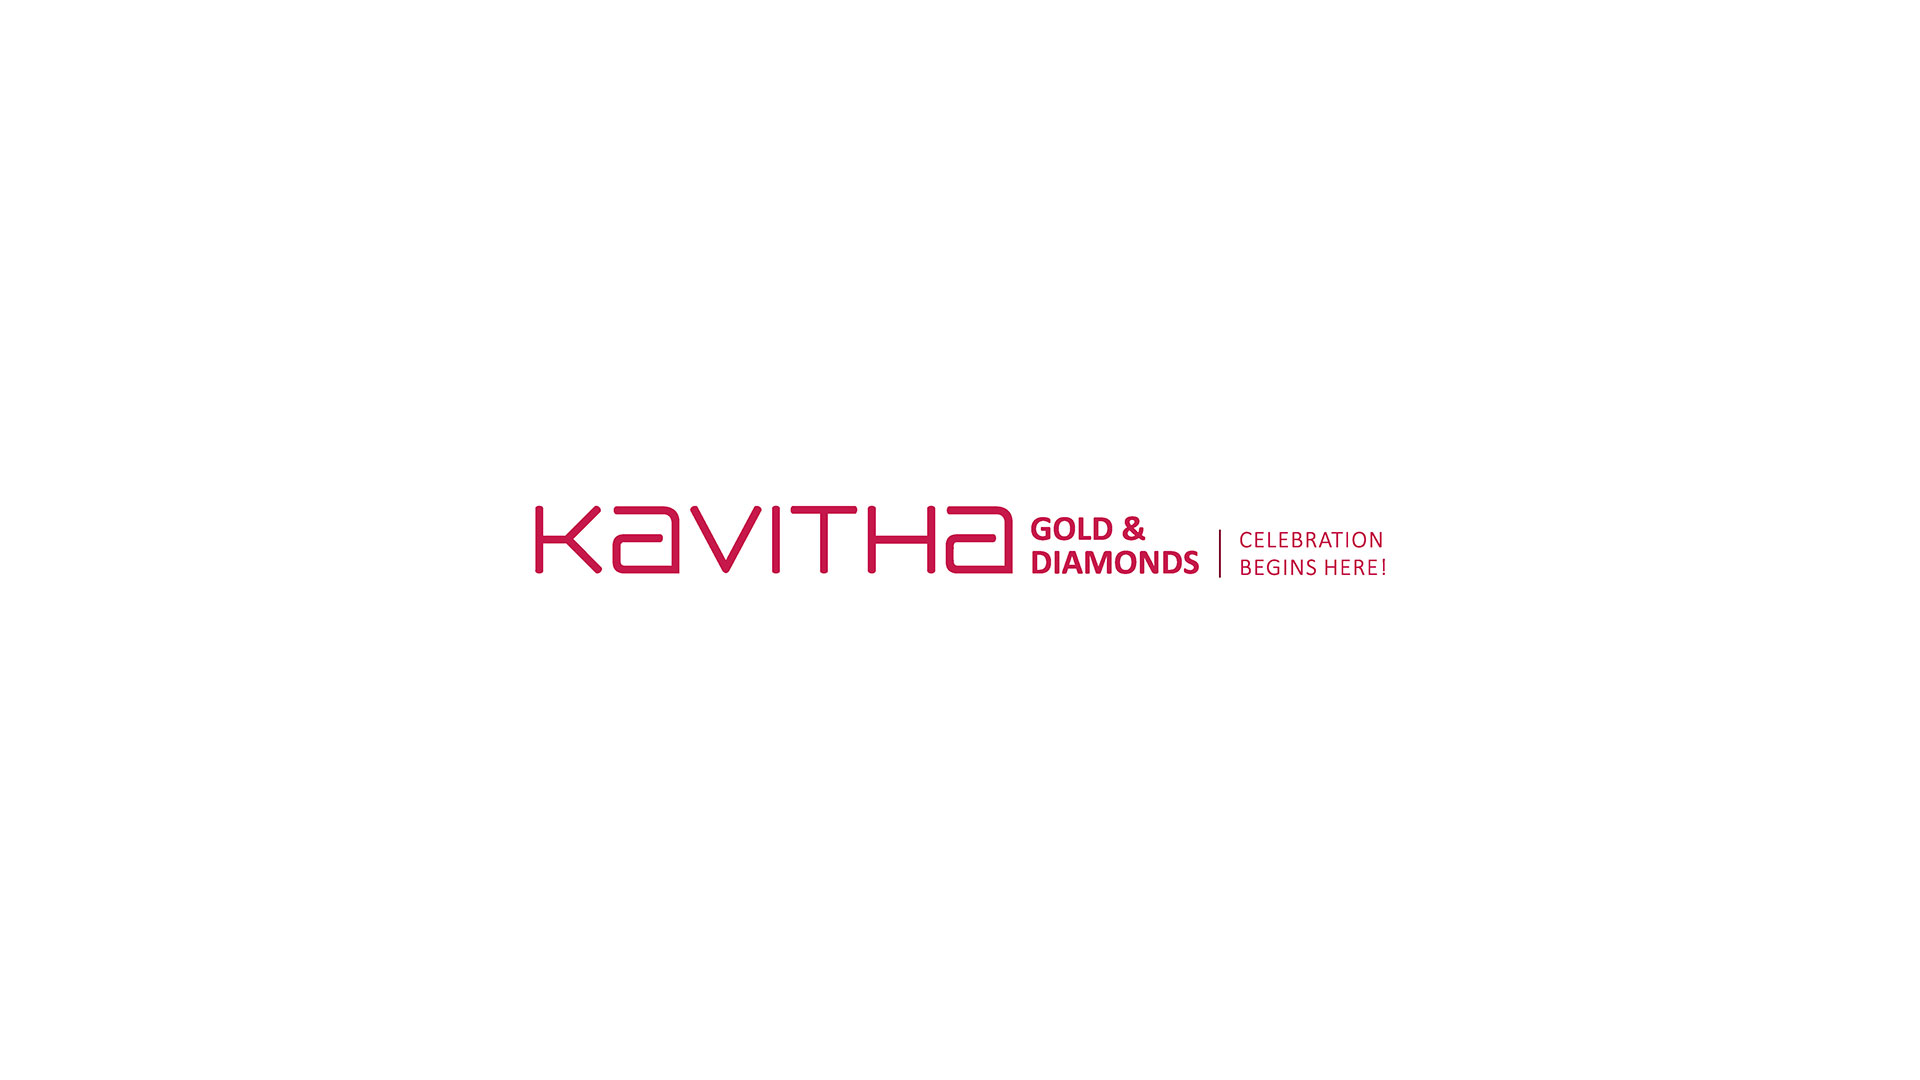 Kavtiha Gold & Diamonds Logo on white background